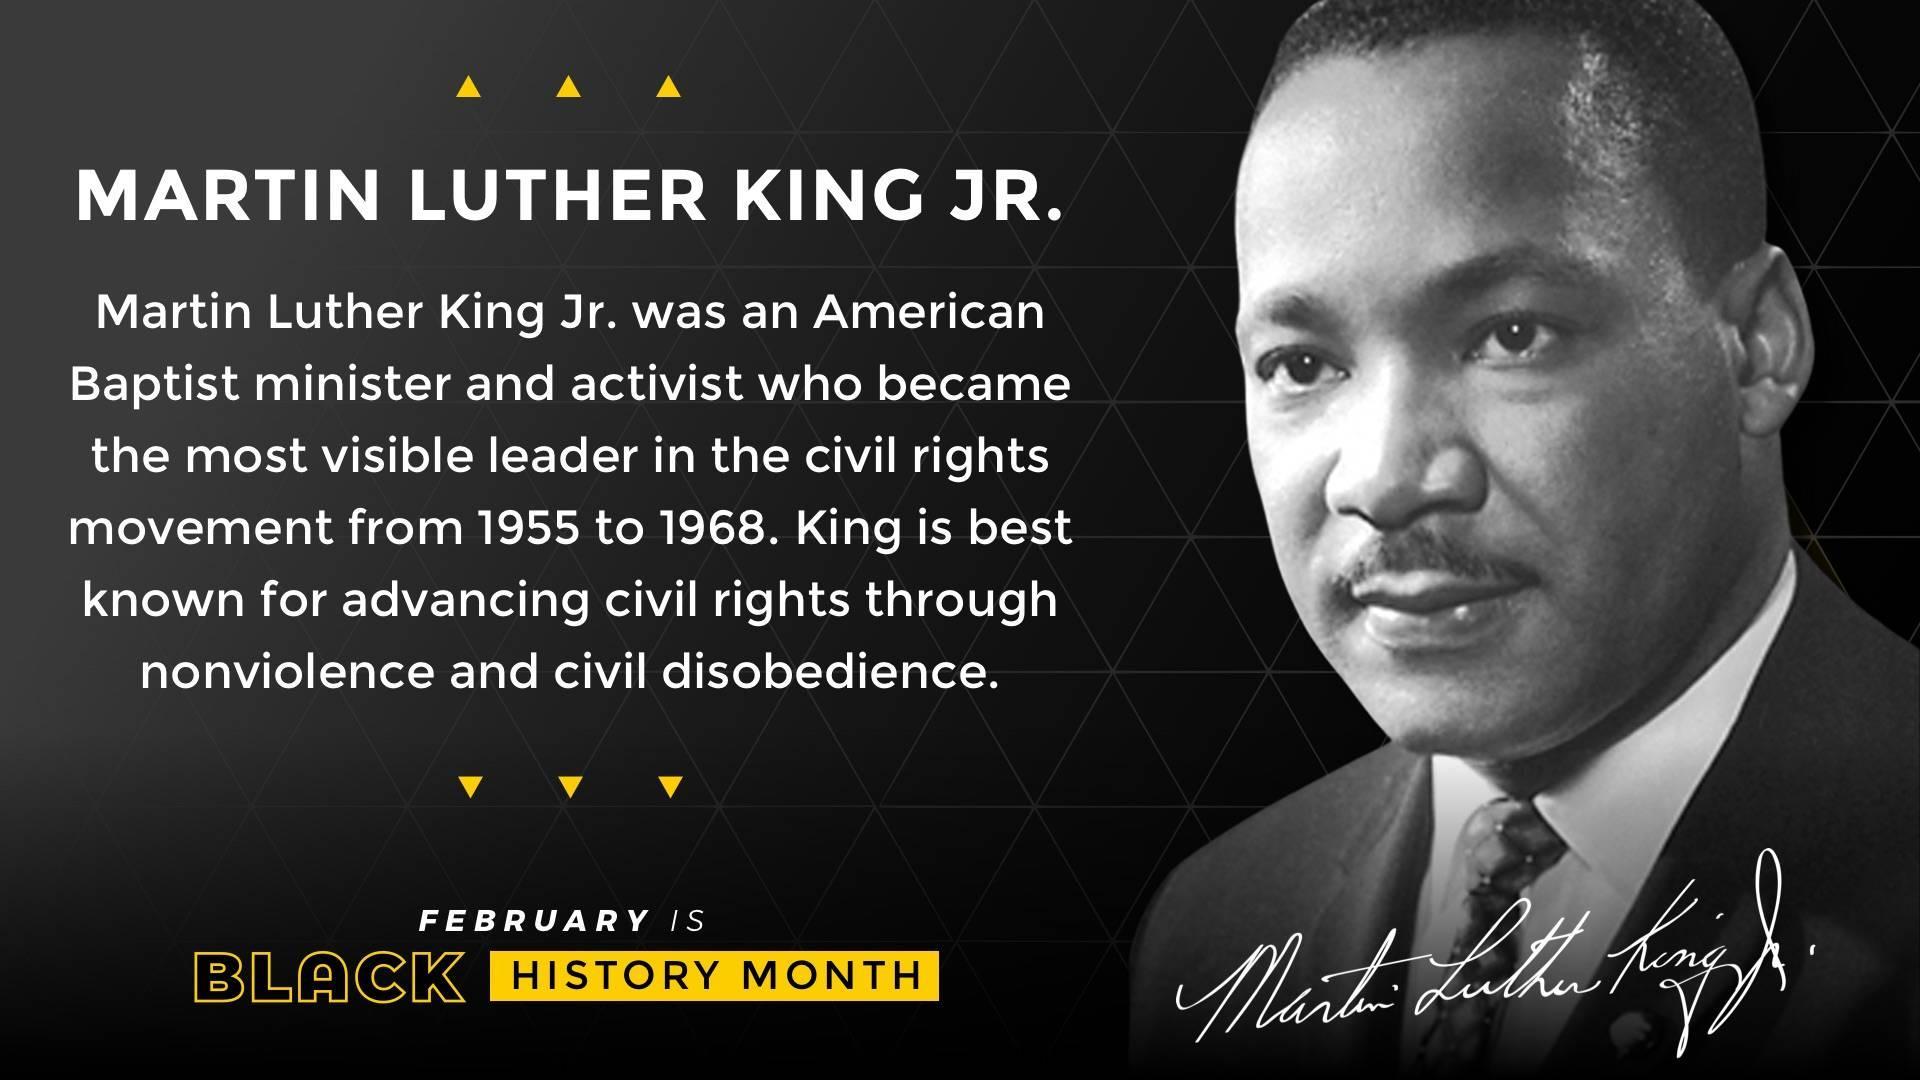 Black History Month Martin Luther King Jr. Digital Signage Template